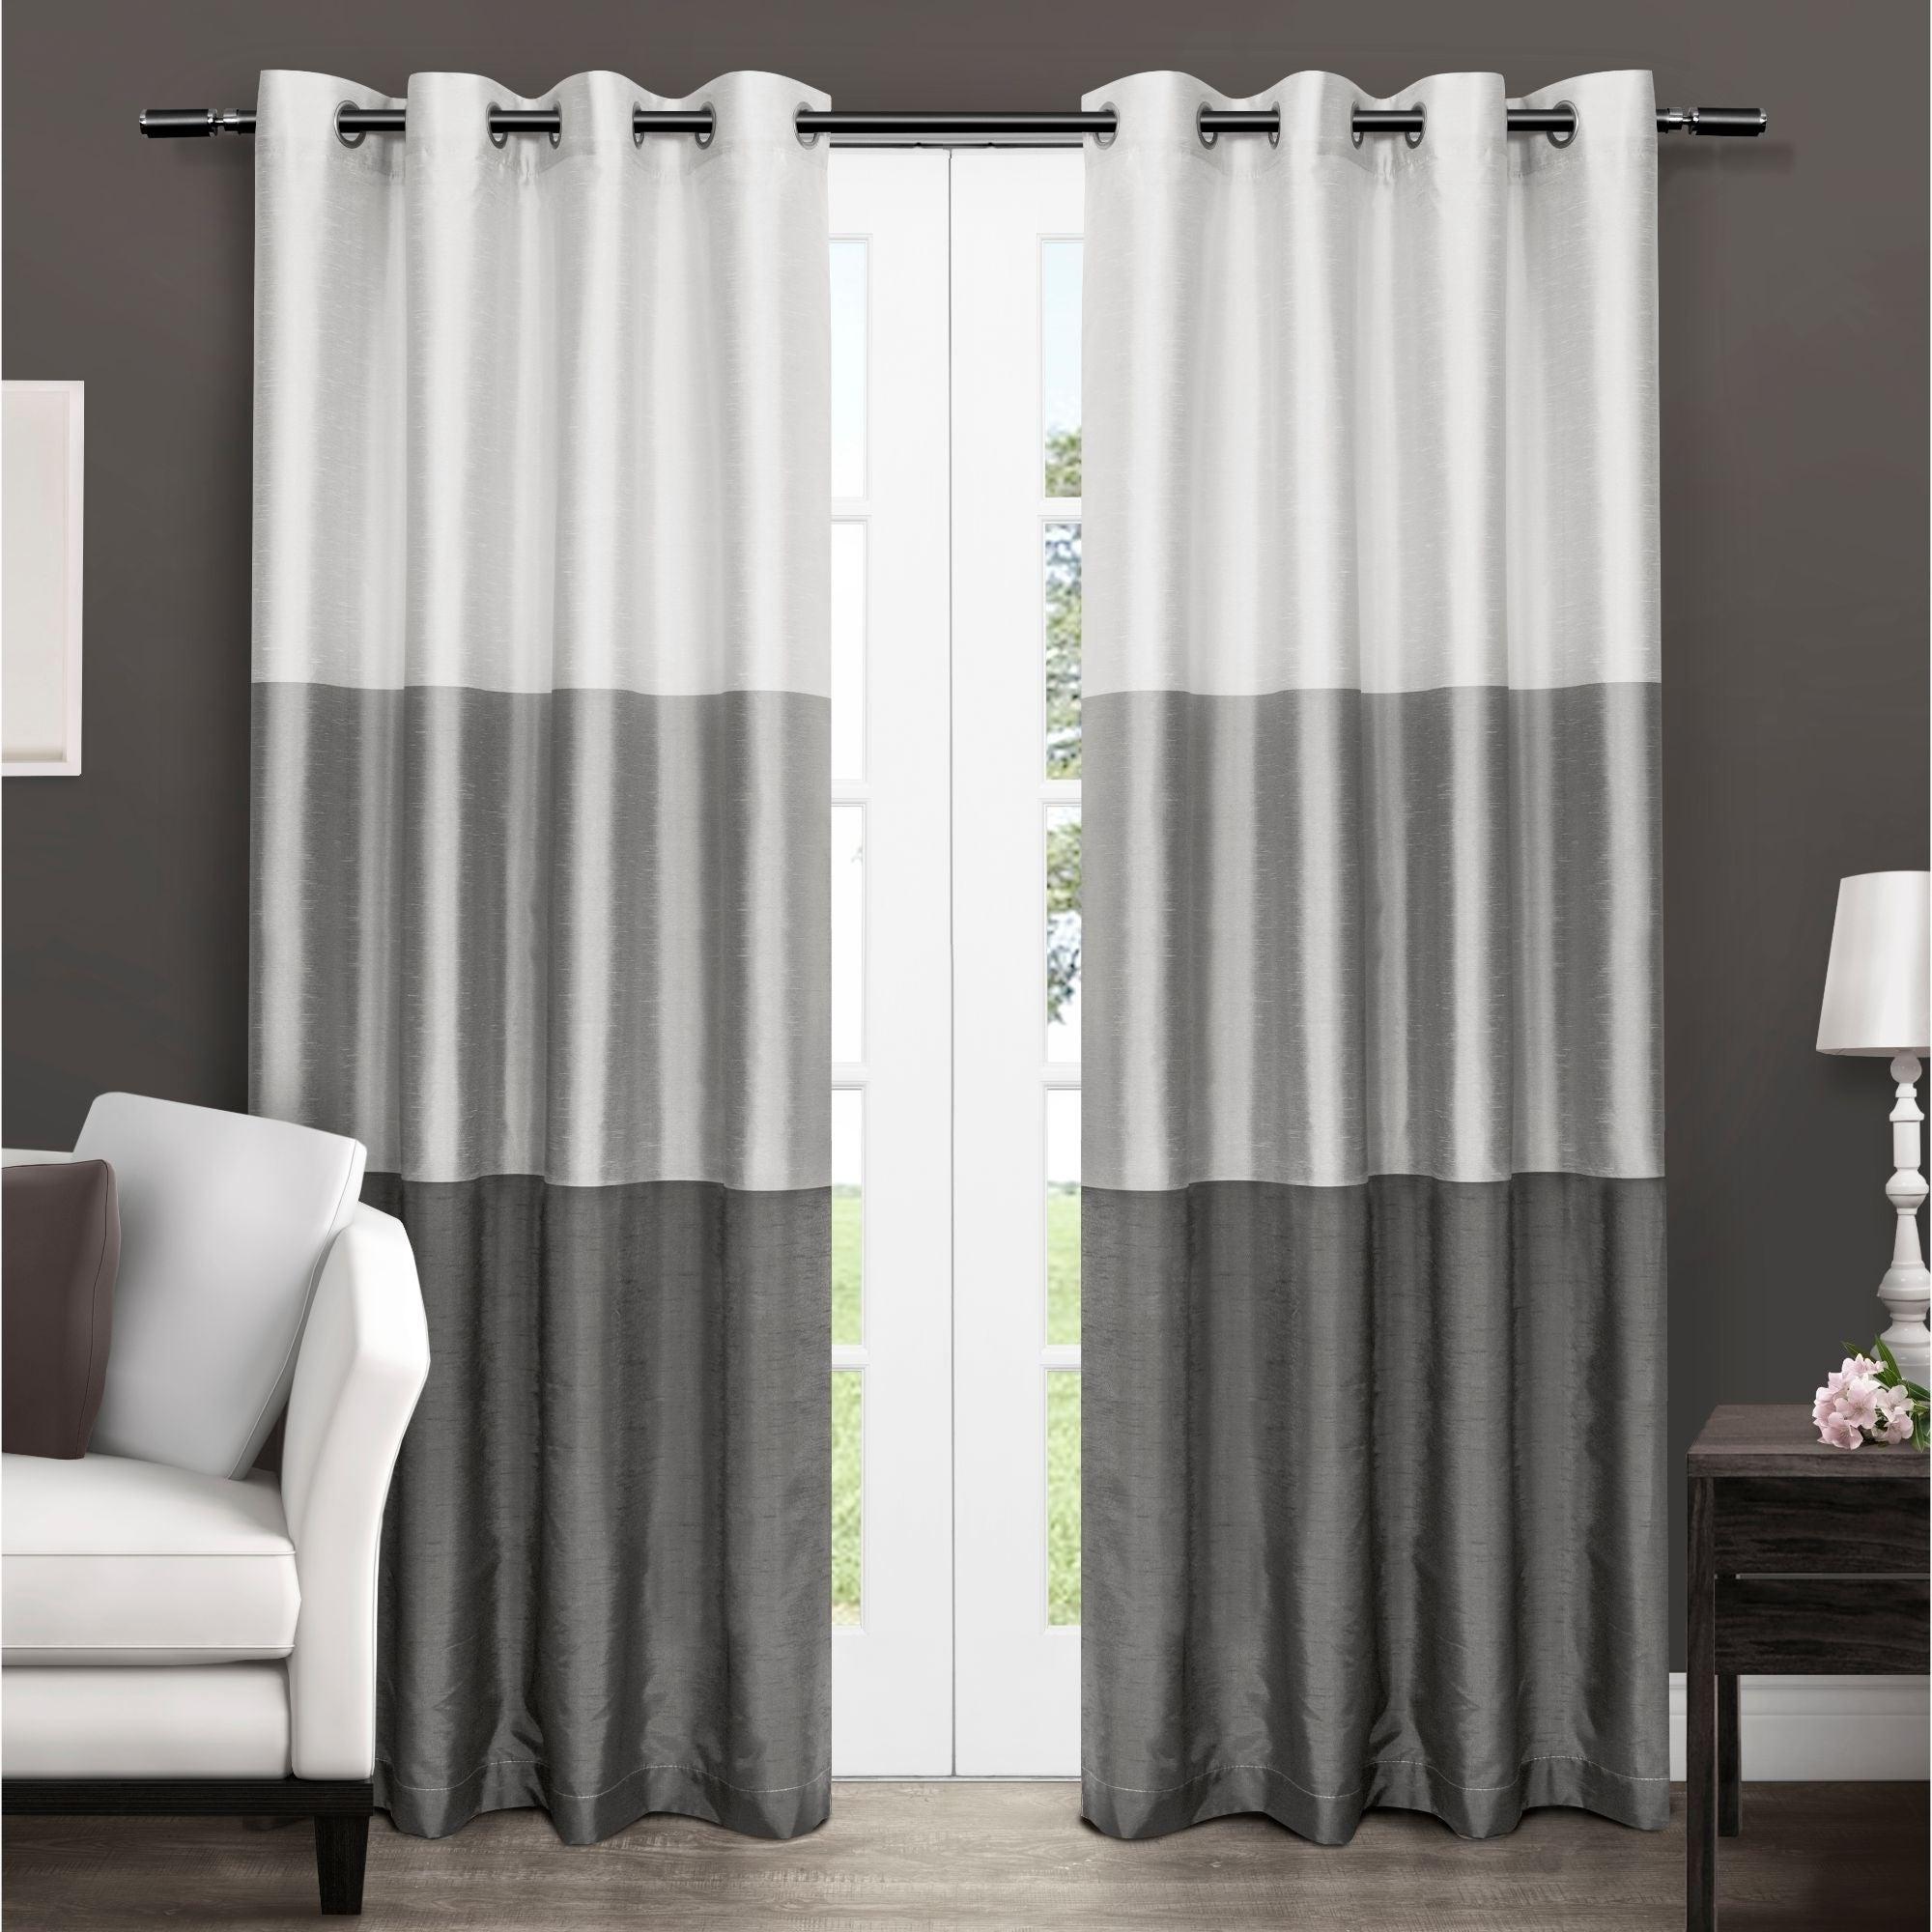 Popular Ocean Striped Window Curtain Panel Pairs With Grommet Top Inside Porch & Den Ocean Striped Window Curtain Panel Pair With Grommet Top (View 2 of 20)